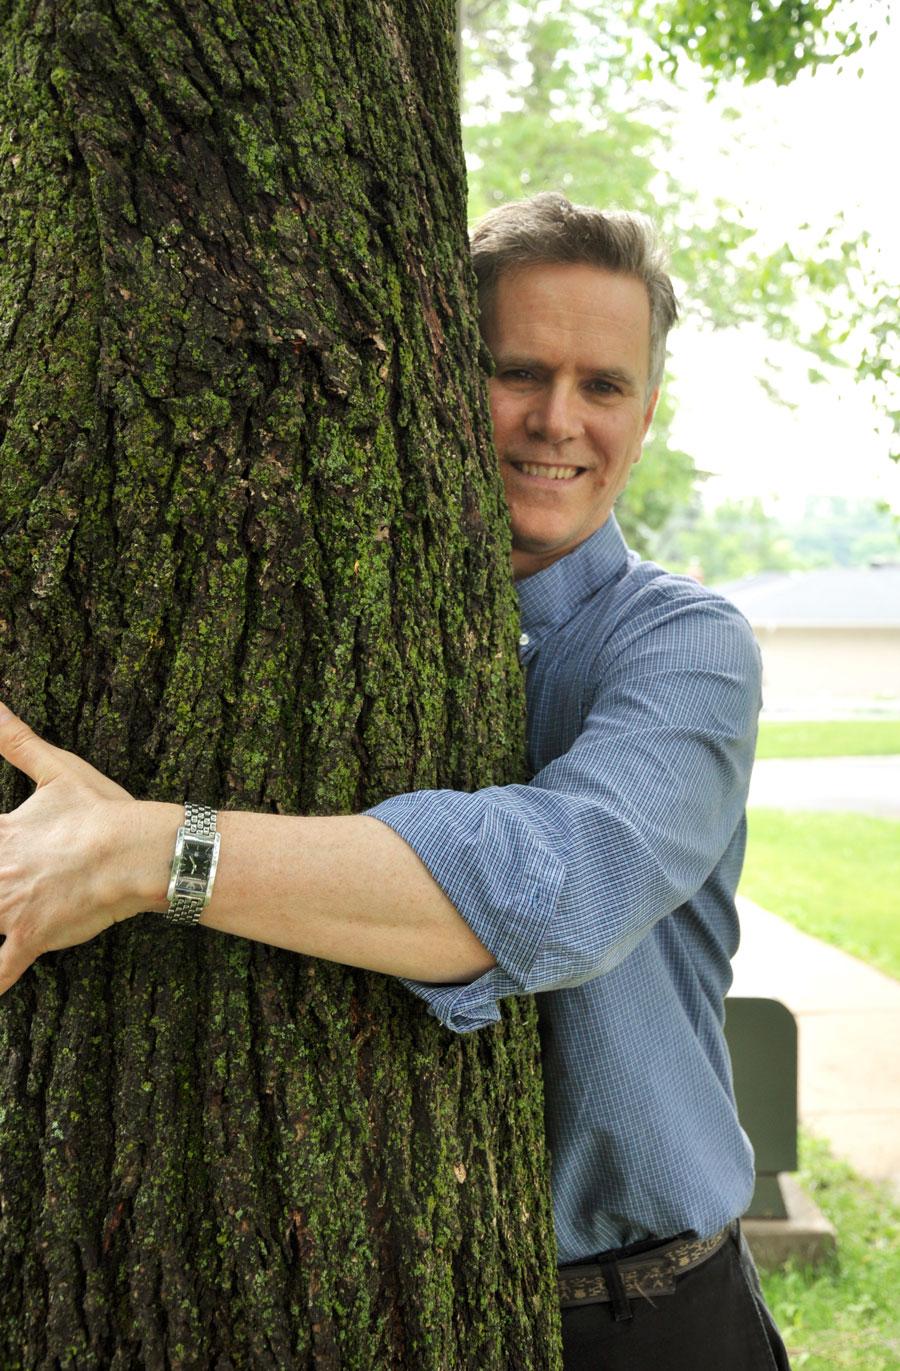 Man hugging a tree, wearing blue button up long-sleeved shirt